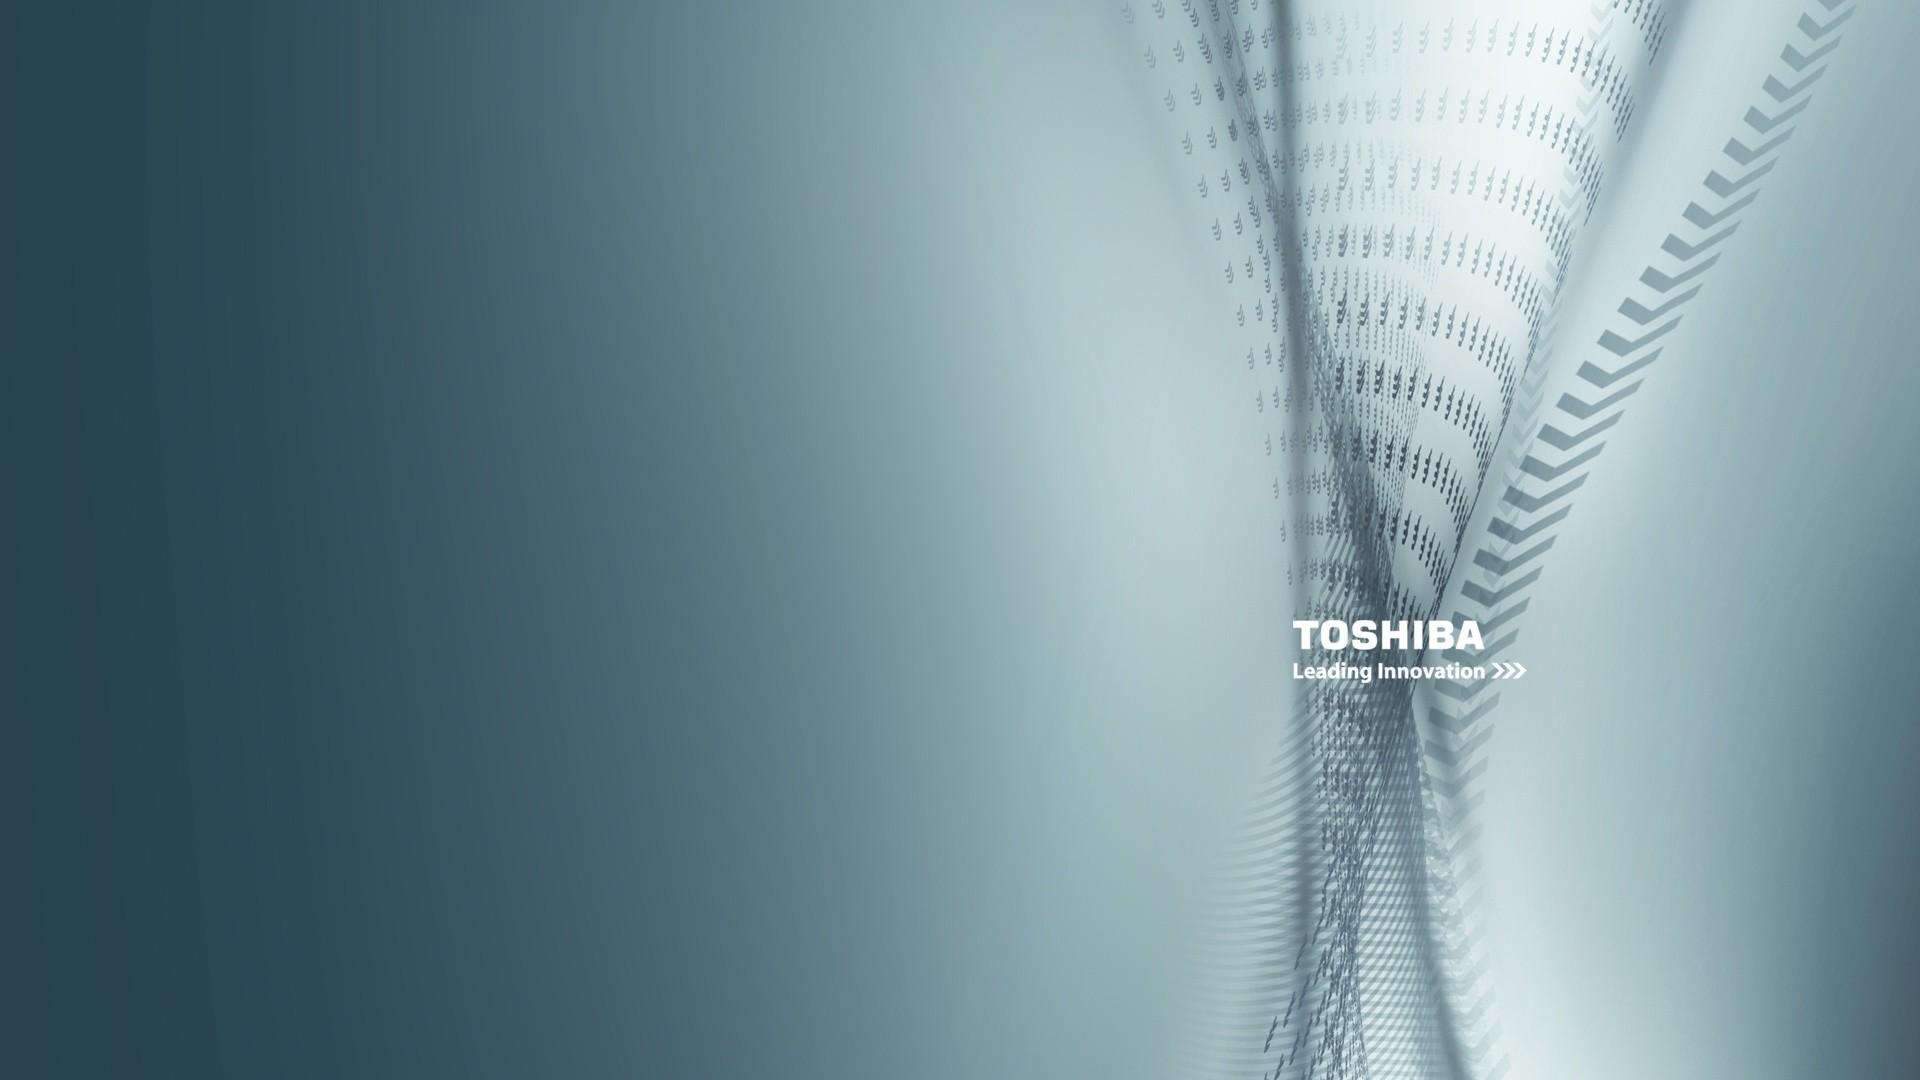 Toshiba HD Wallpaper 2015 HD Wallpapers